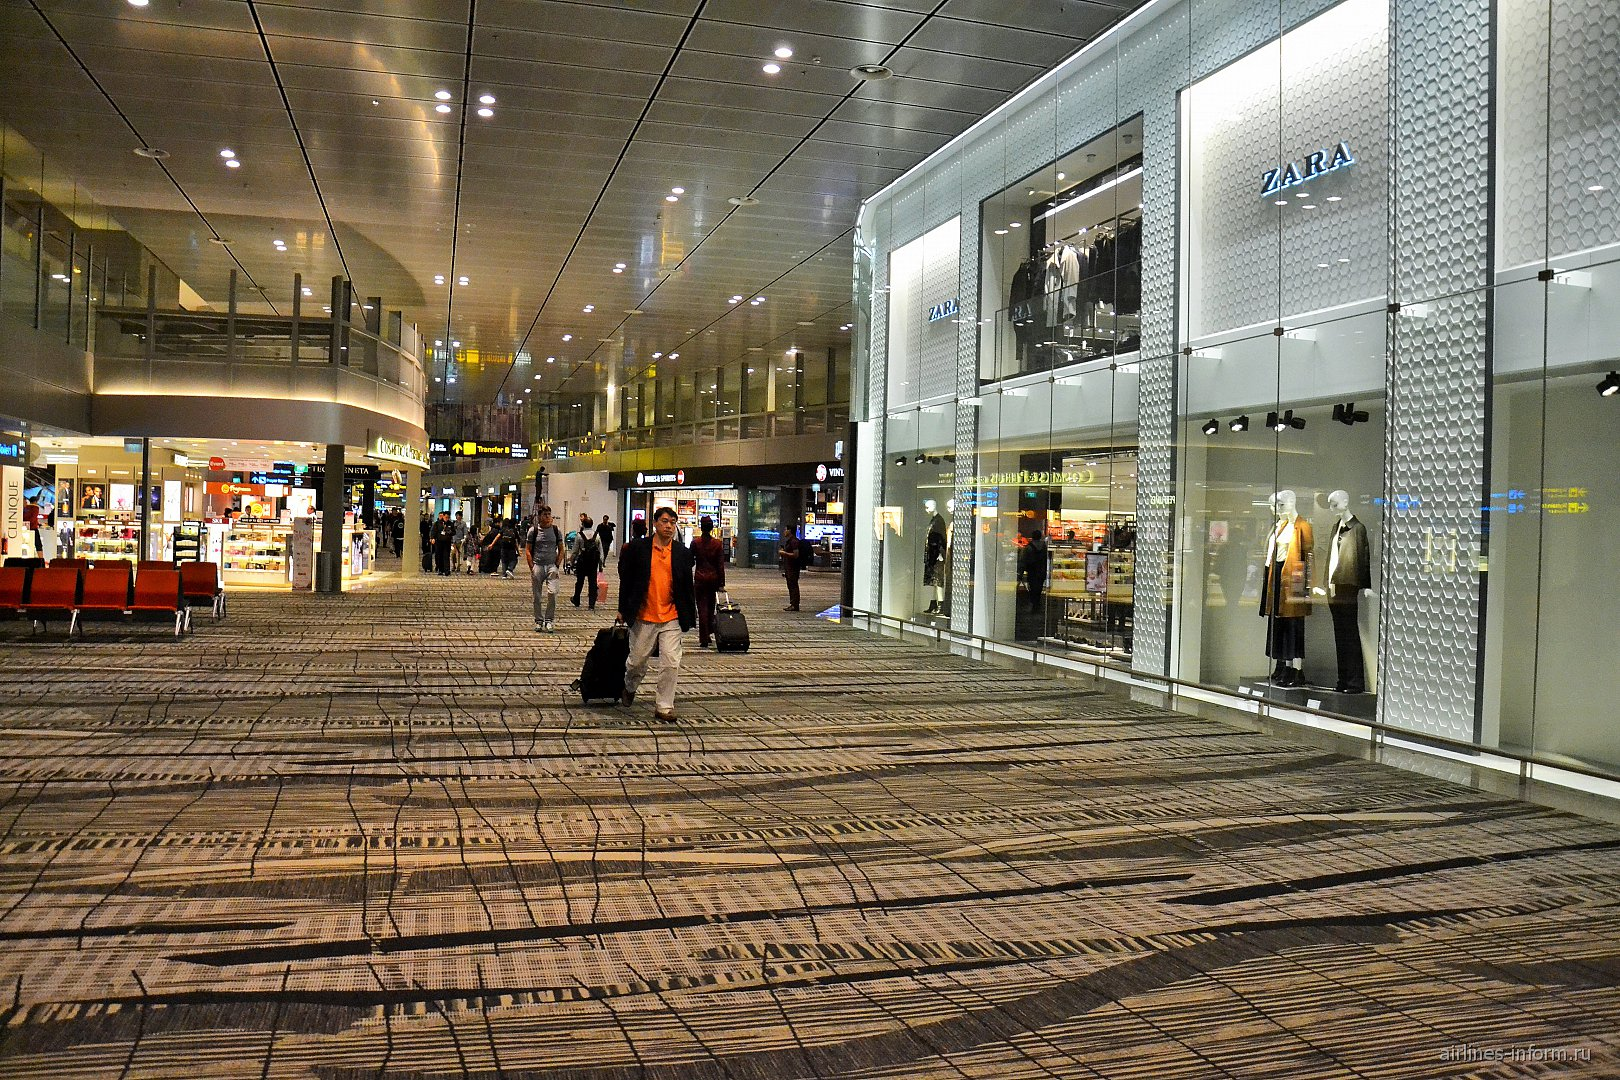 Галерея дьюти-фри в терминале 3 аэропорта Сингапур Чанги